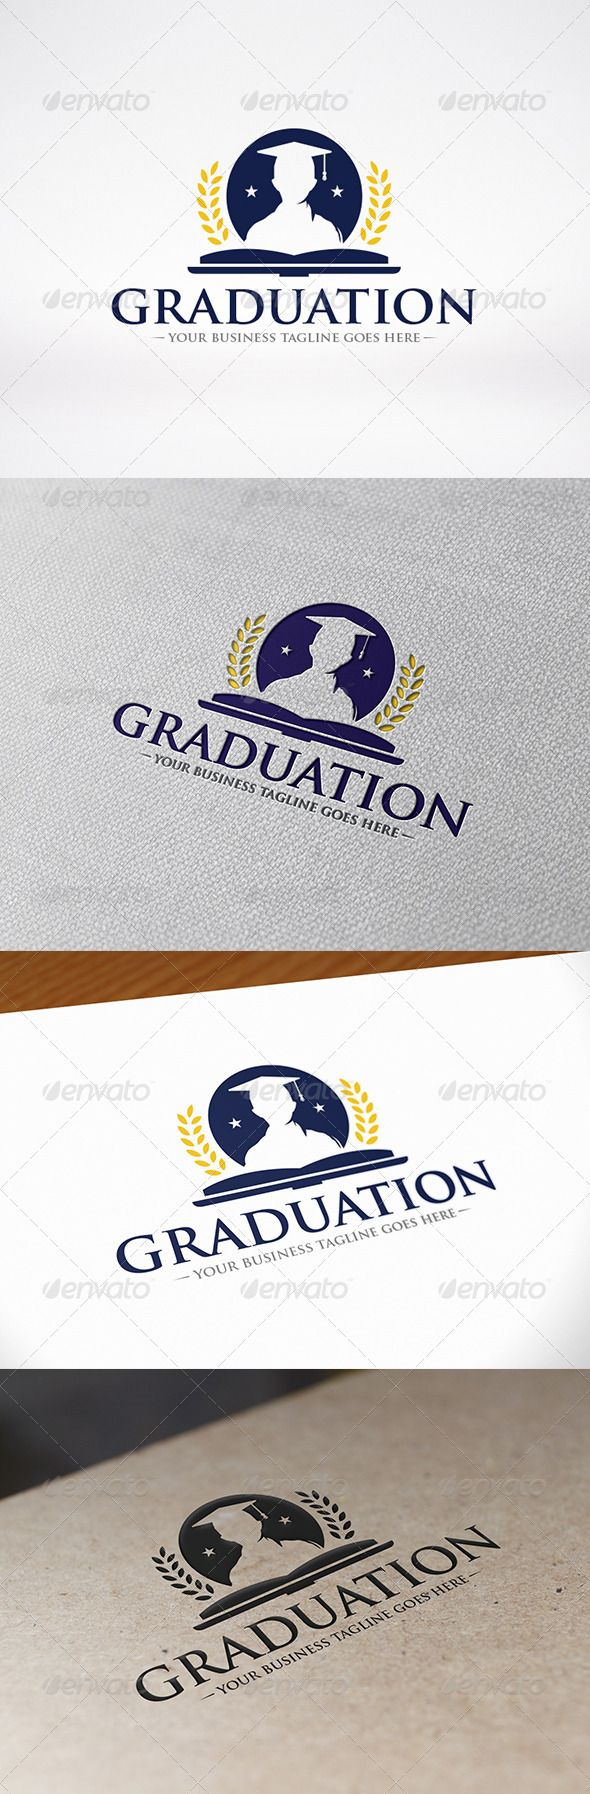 University Graduation Logo Template — Vector EPS #university logo #ubication • Available here → https://graphicriver.net/item/university-graduation-logo-template/8626072?ref=pxcr